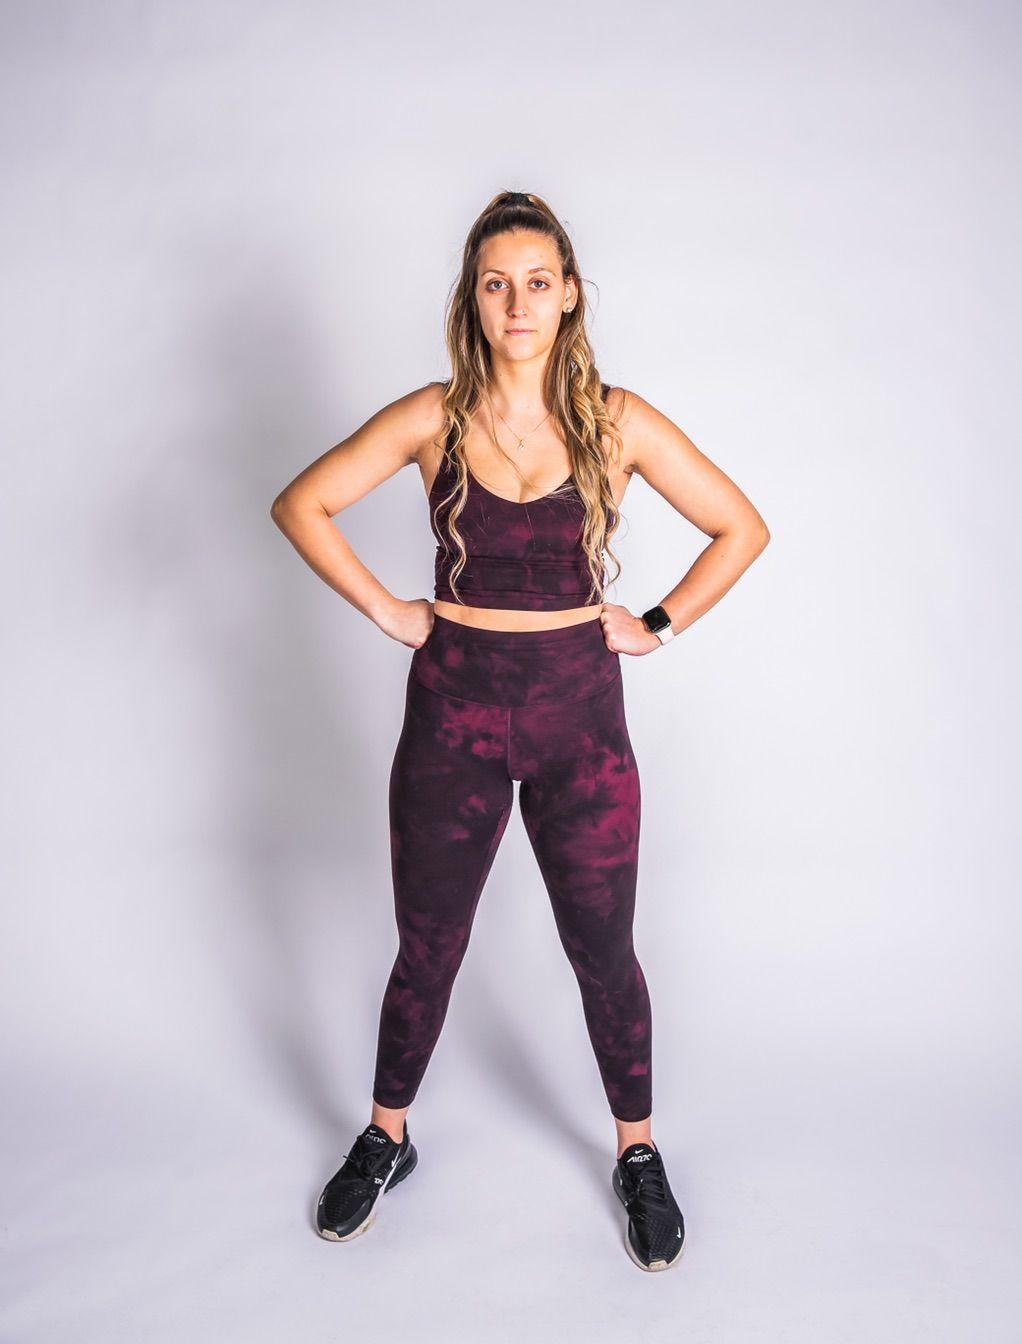 Cali Flow Fitness & Nutrition LLC